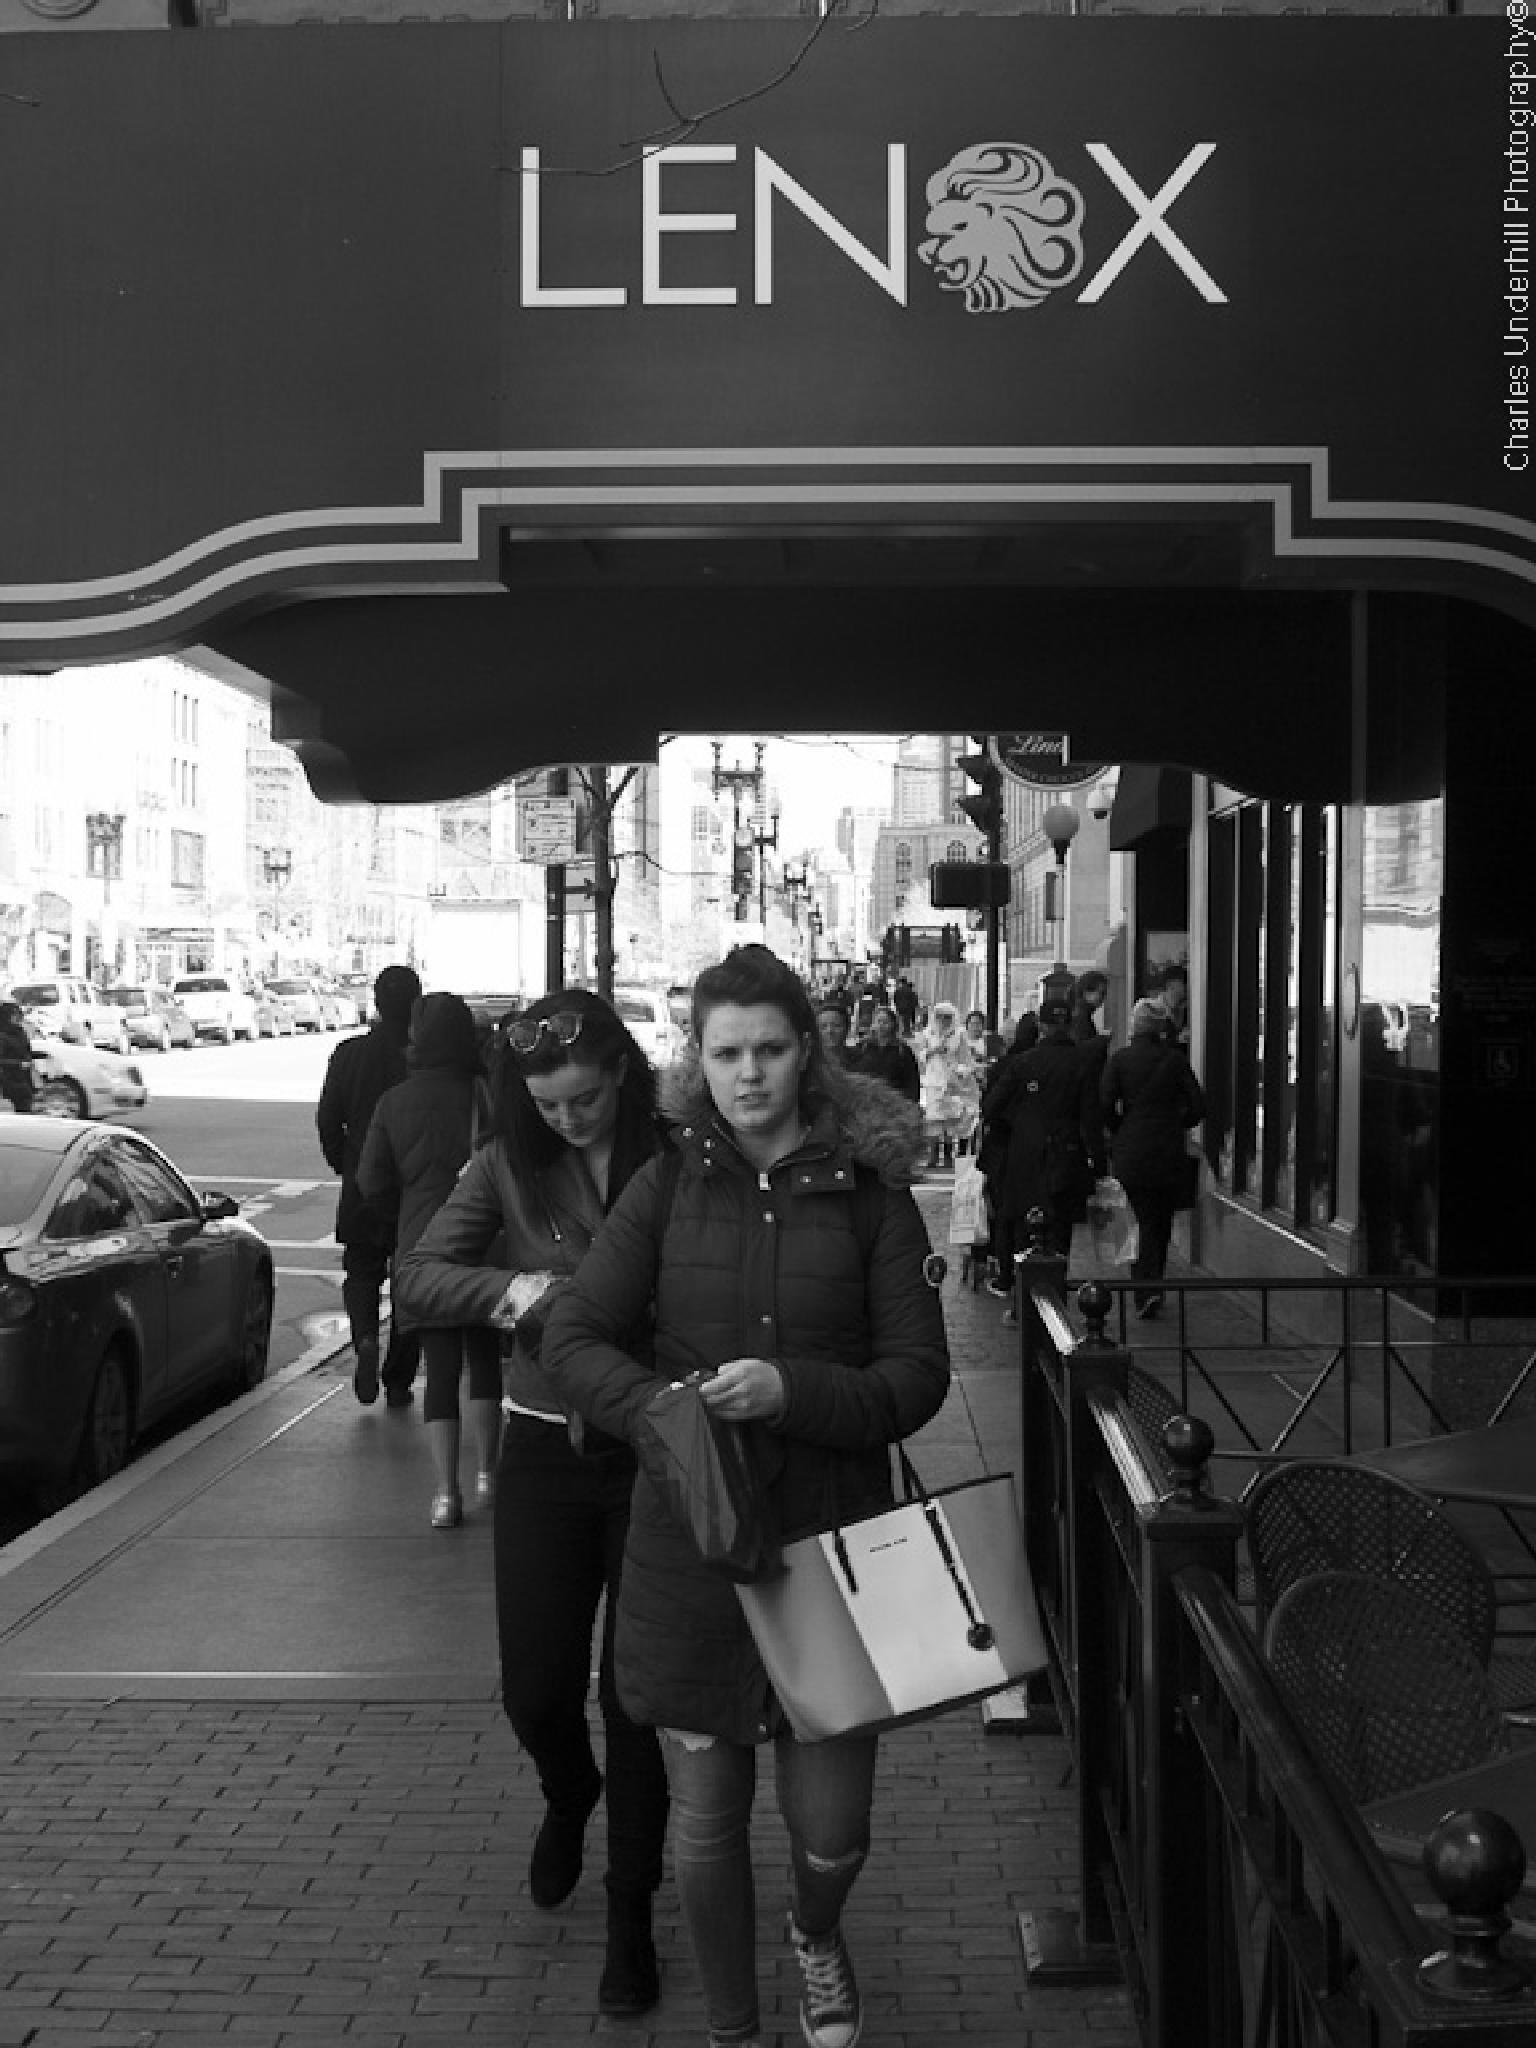 Lenox by caffeineandcameras